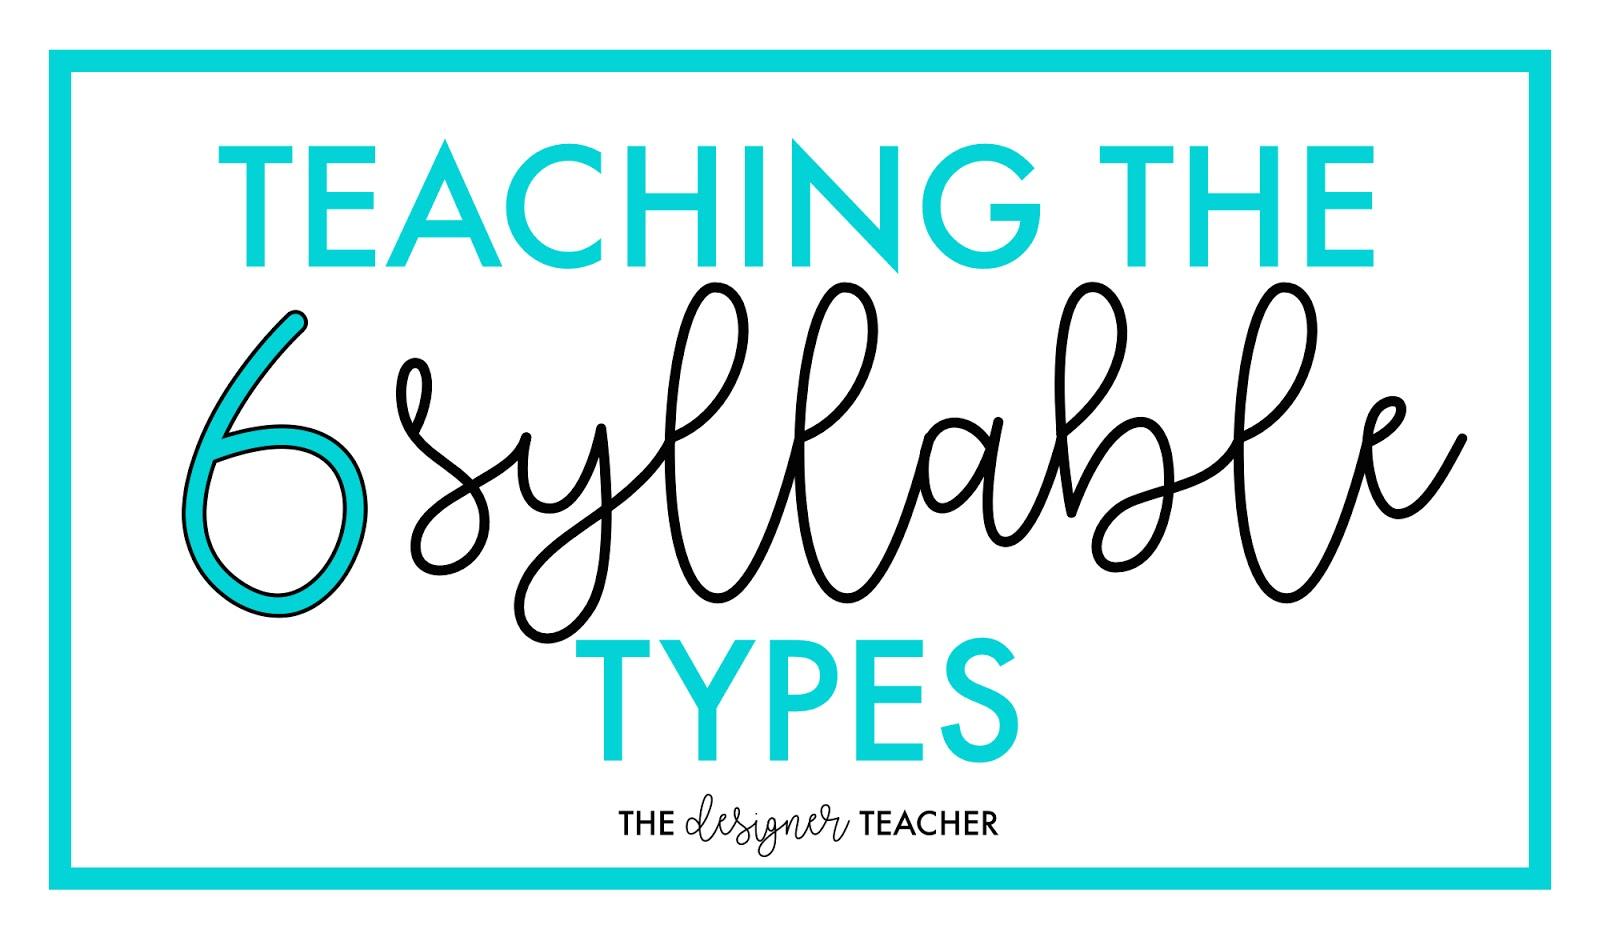 The Designer Teacher Teaching The Six Syllable Types